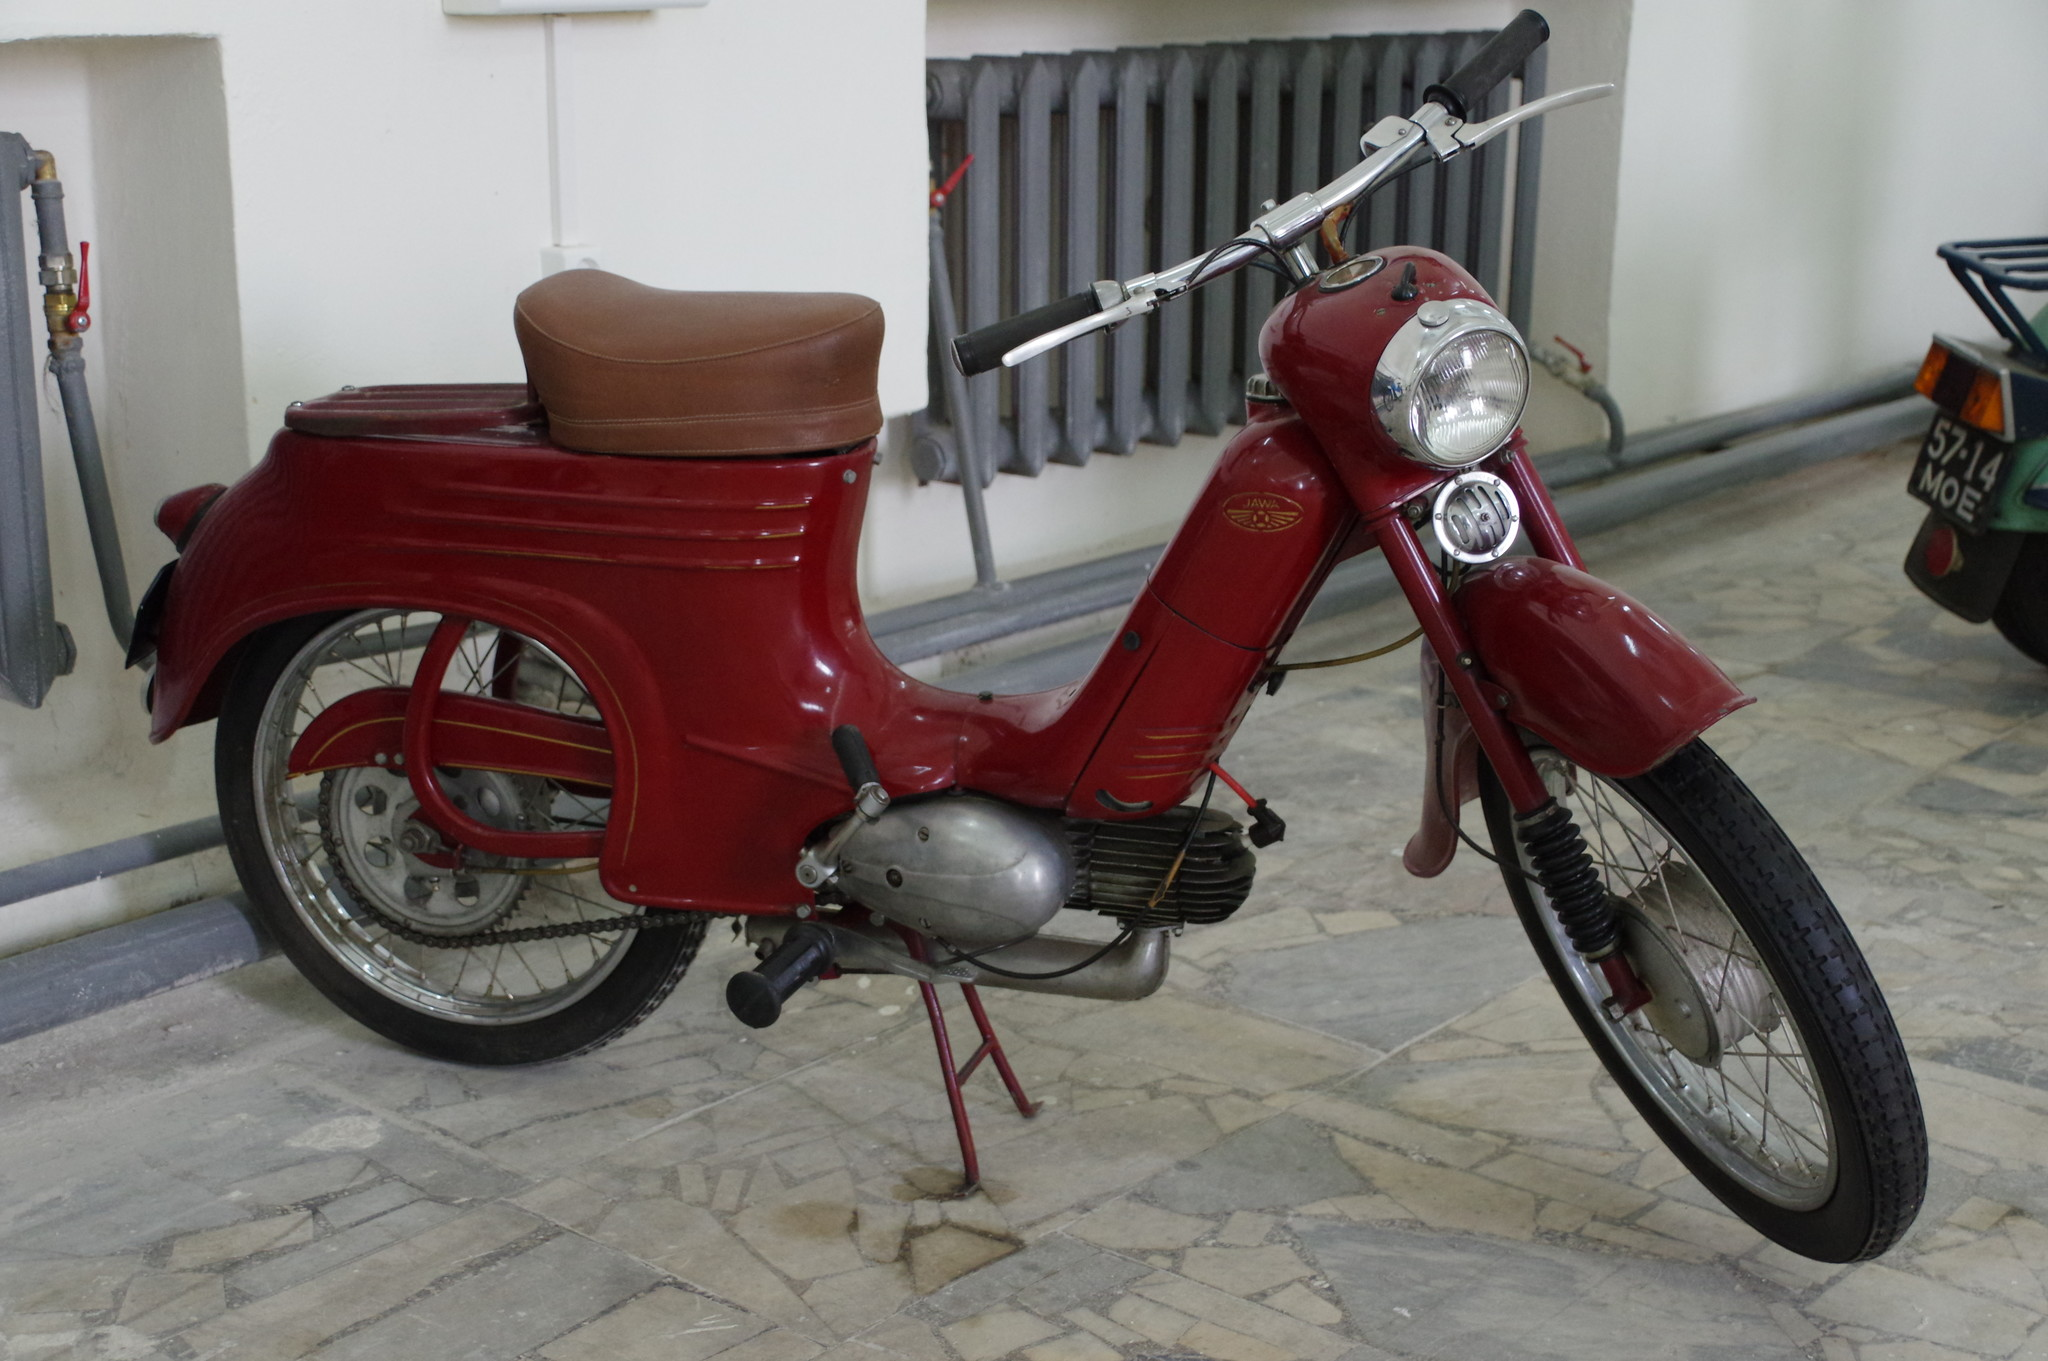 Мопед Jawa Pioneer 50 Typ 555 1958 года выпуска